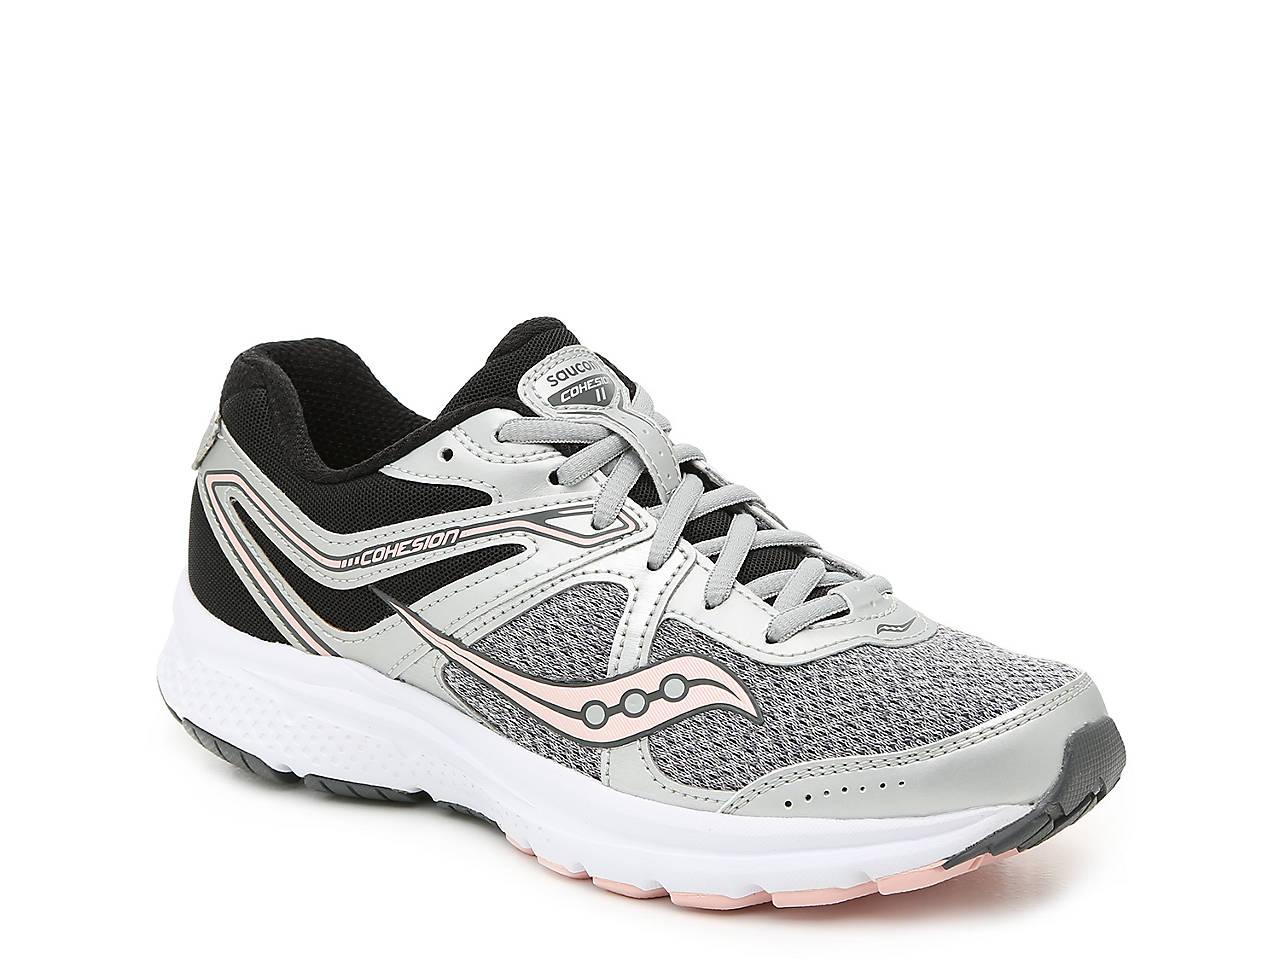 0d2c866899 Grid Cohesion 11 Running Shoe - Women's